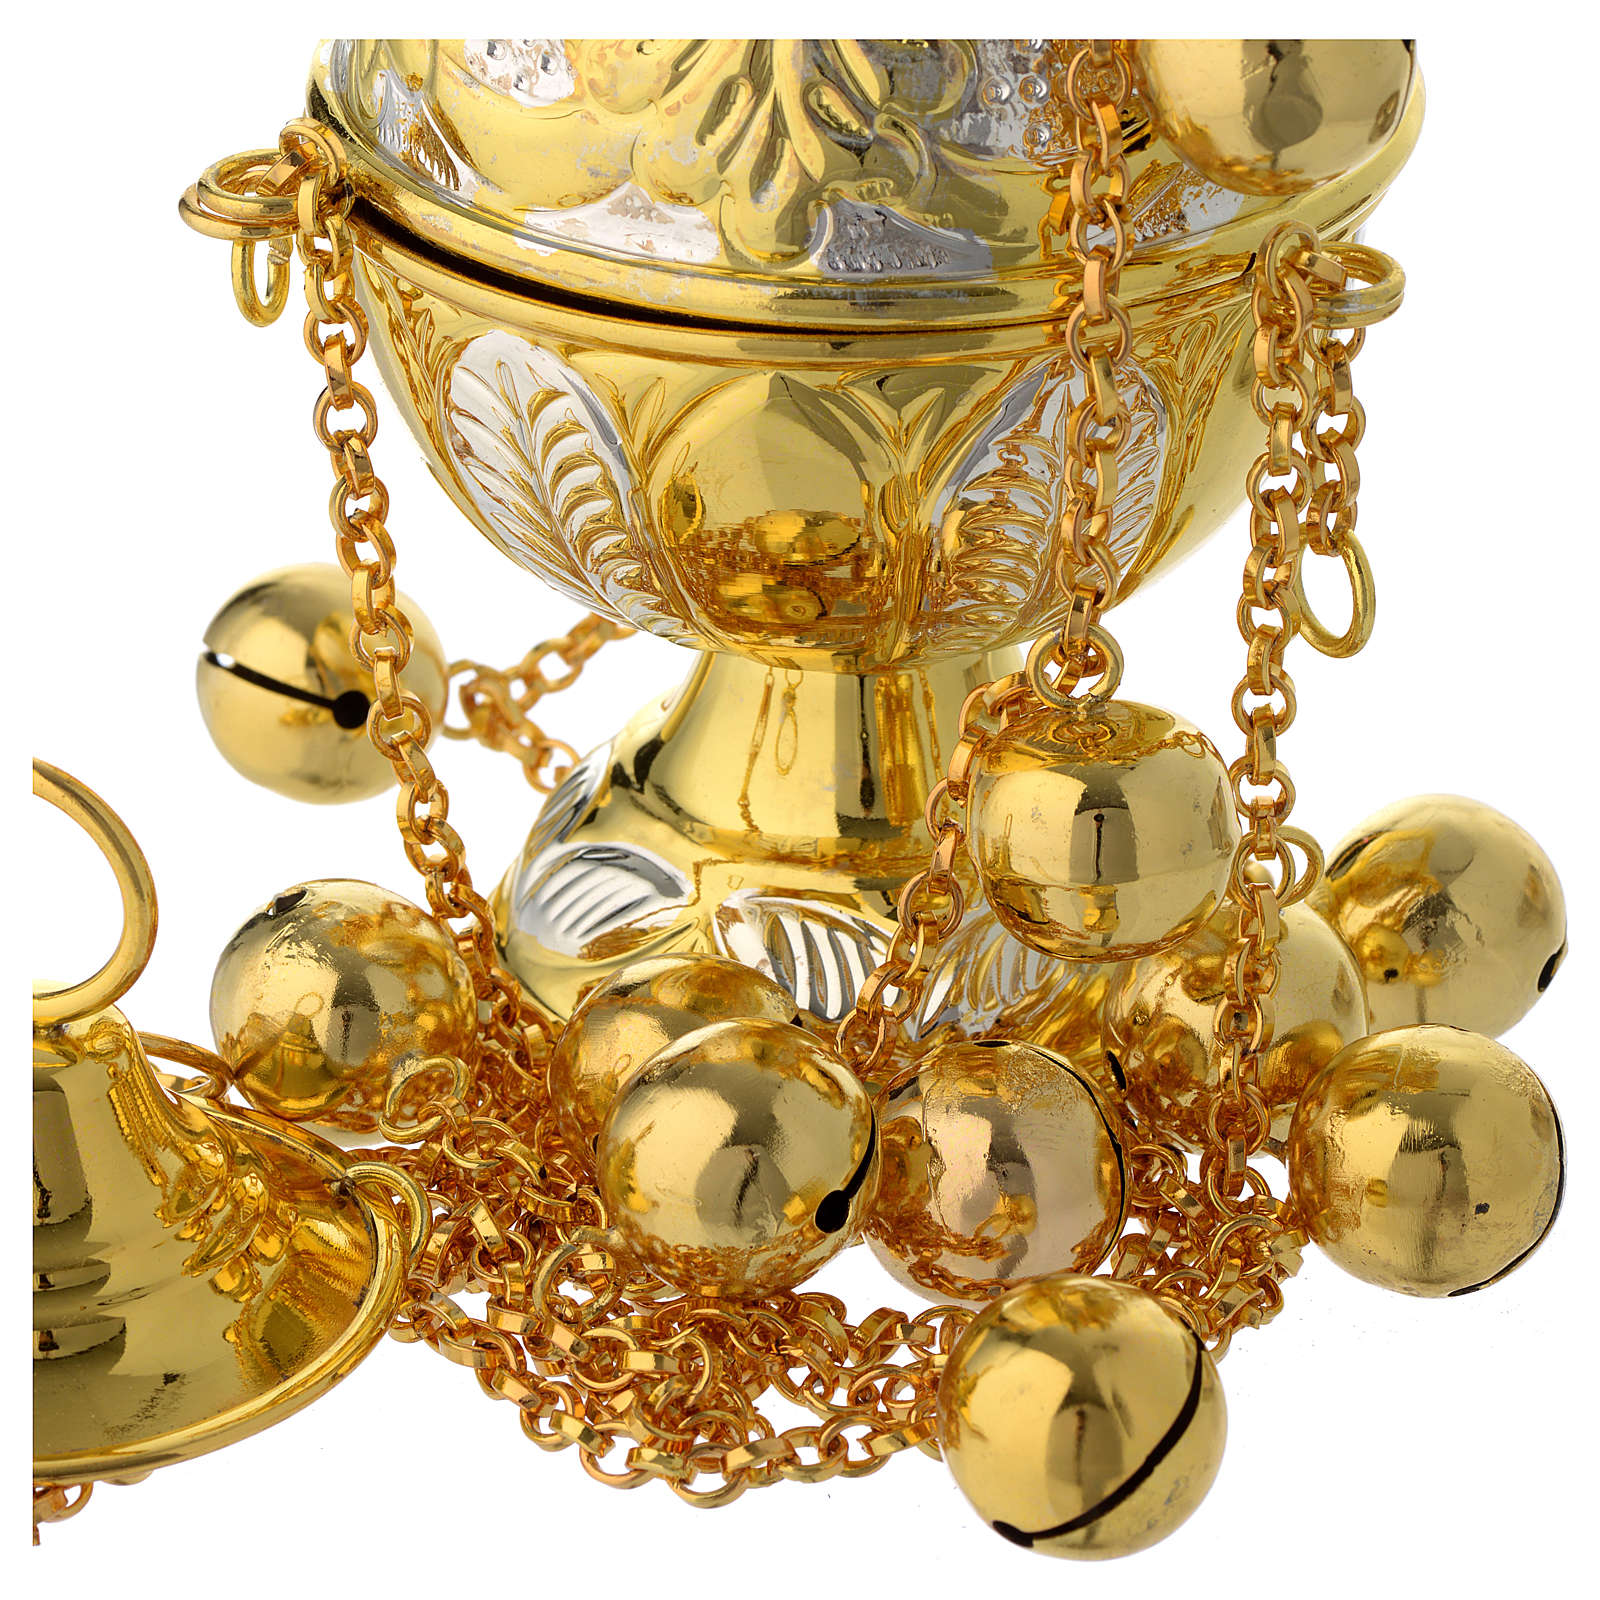 Encensoir style orthodoxe or et argent 3